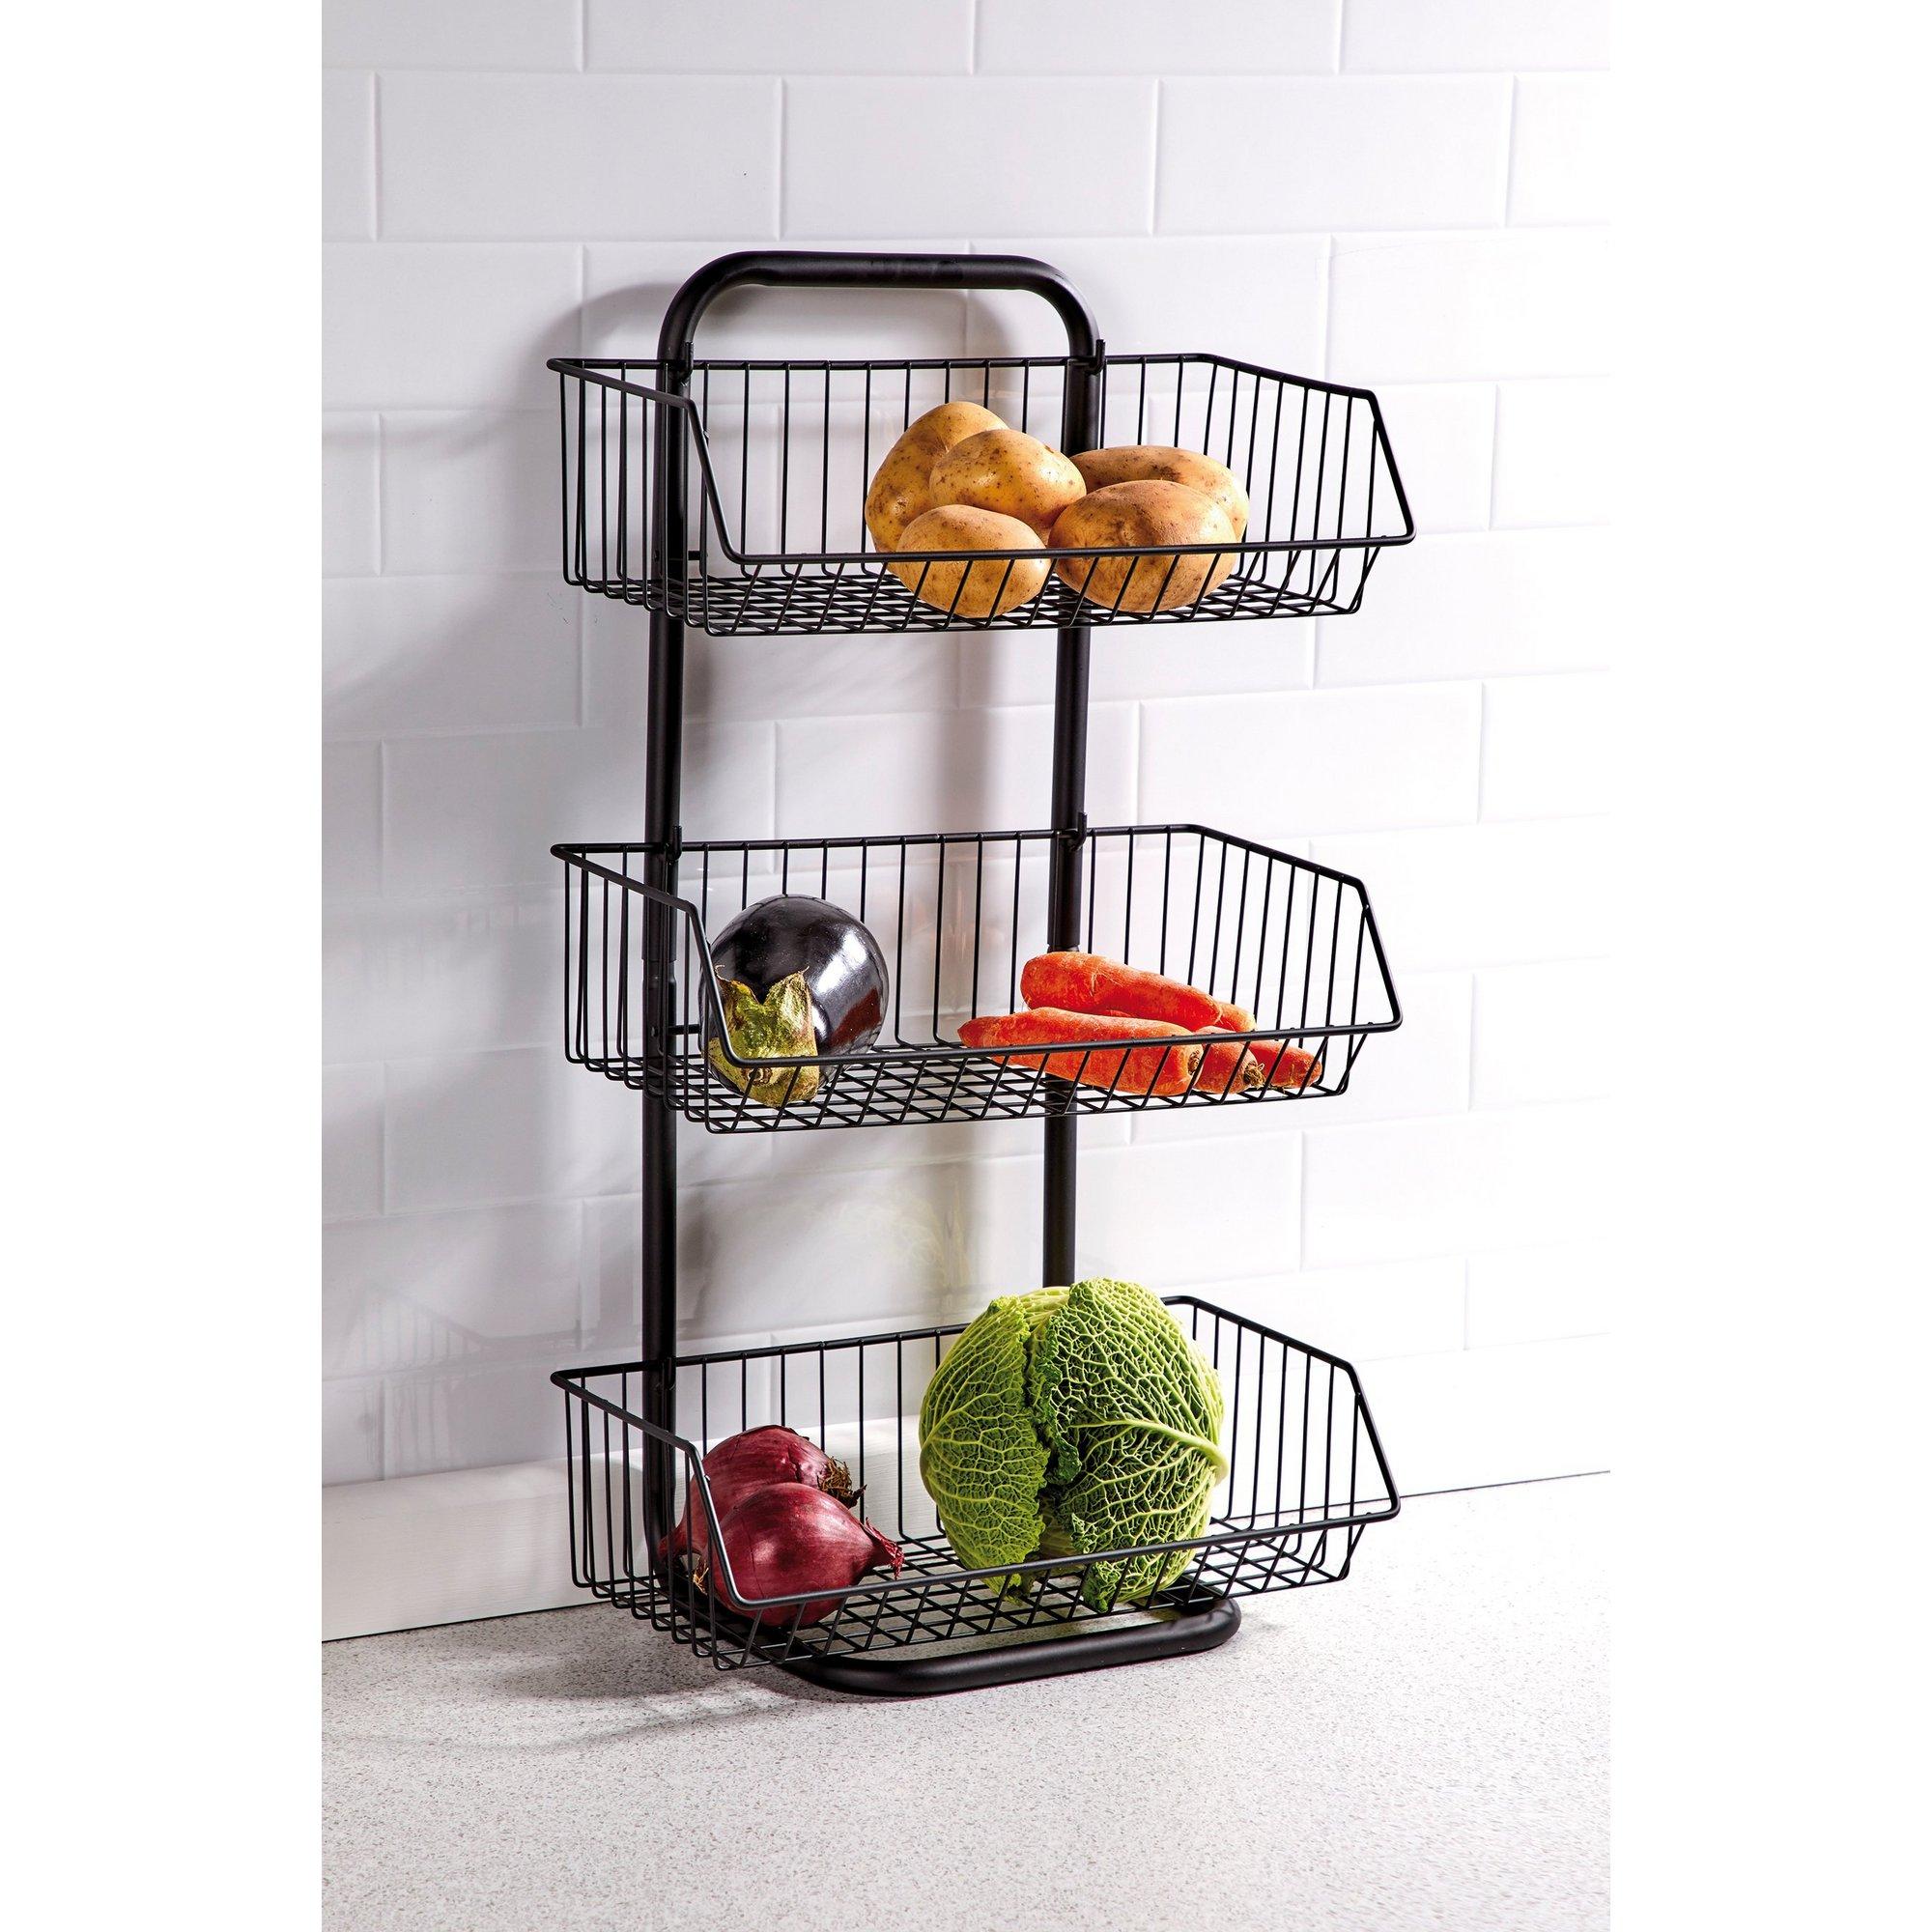 Image of 3-Tier Wire Vegetable Rack